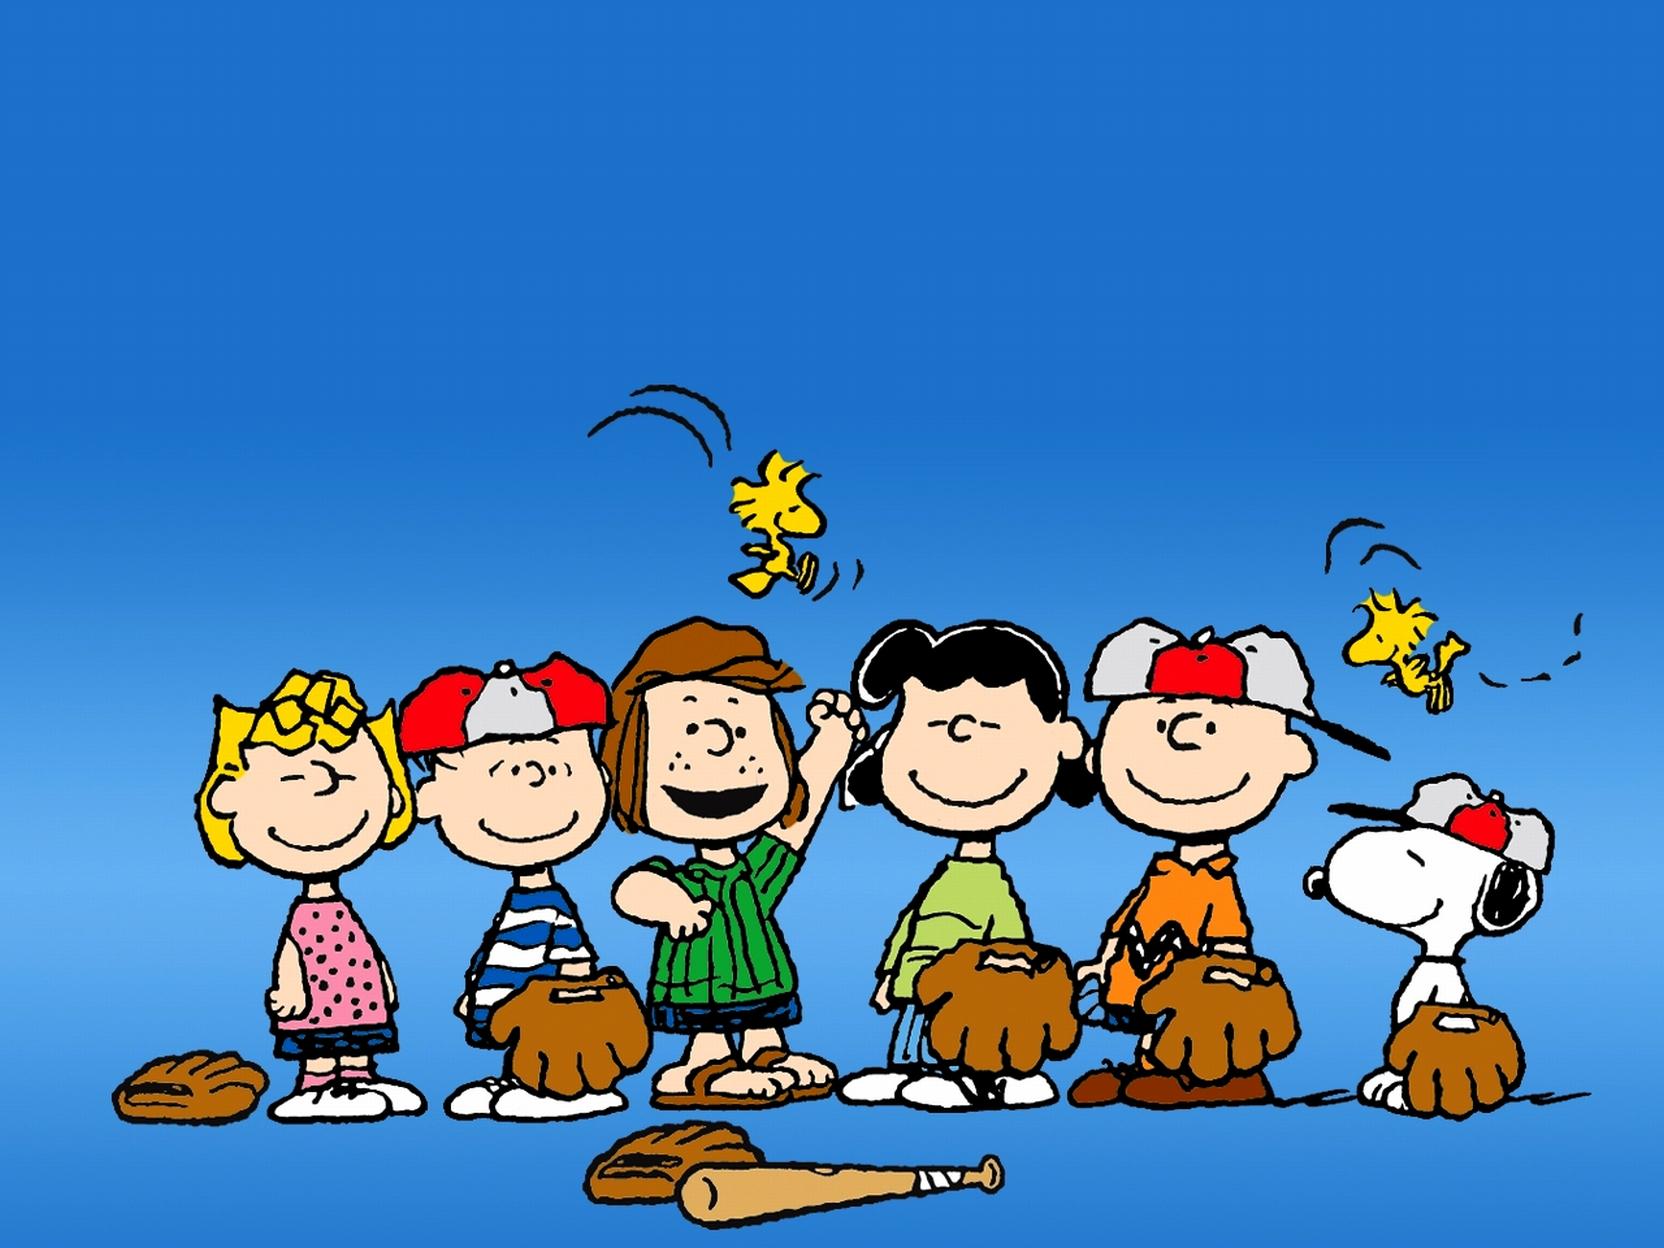 snoopy charlie brown peanuts comic strip desktop 1664x1248 wallpaper 1664x1248